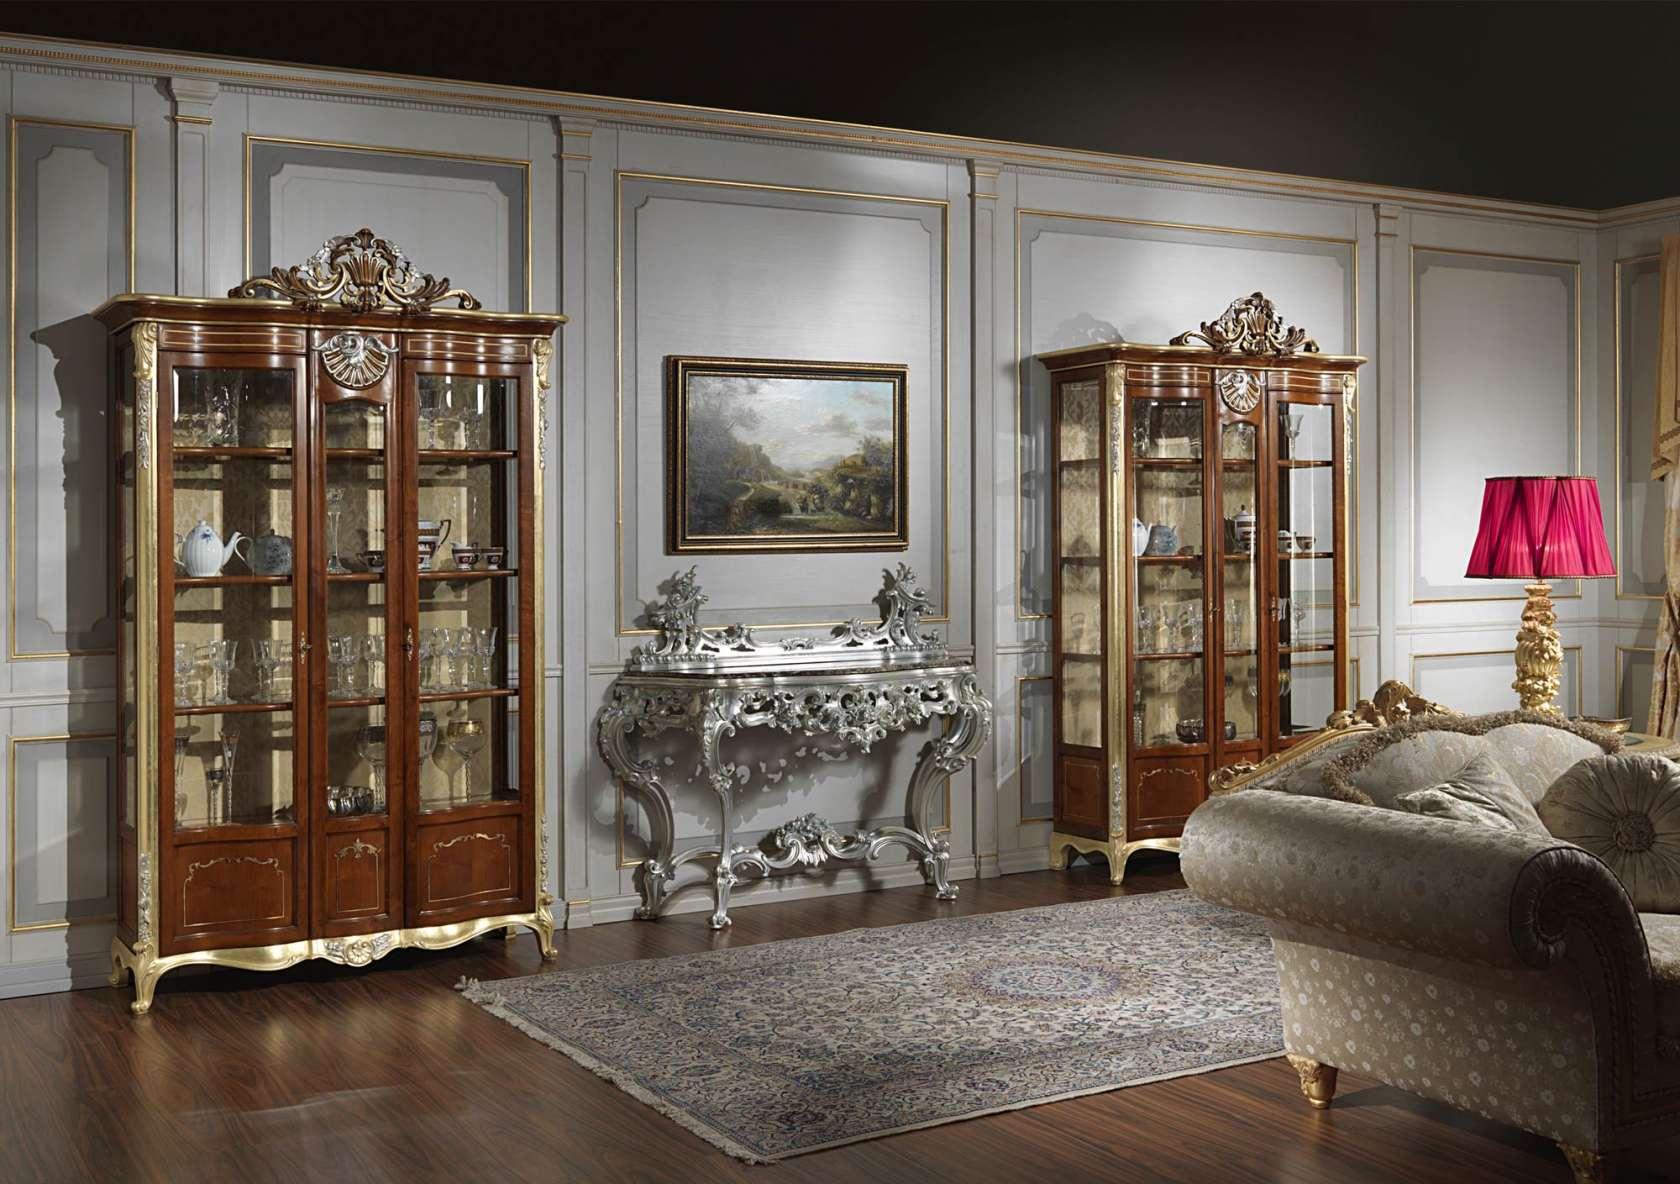 Mobile vetrina per soggiorno in stile classico | Vimercati Meda